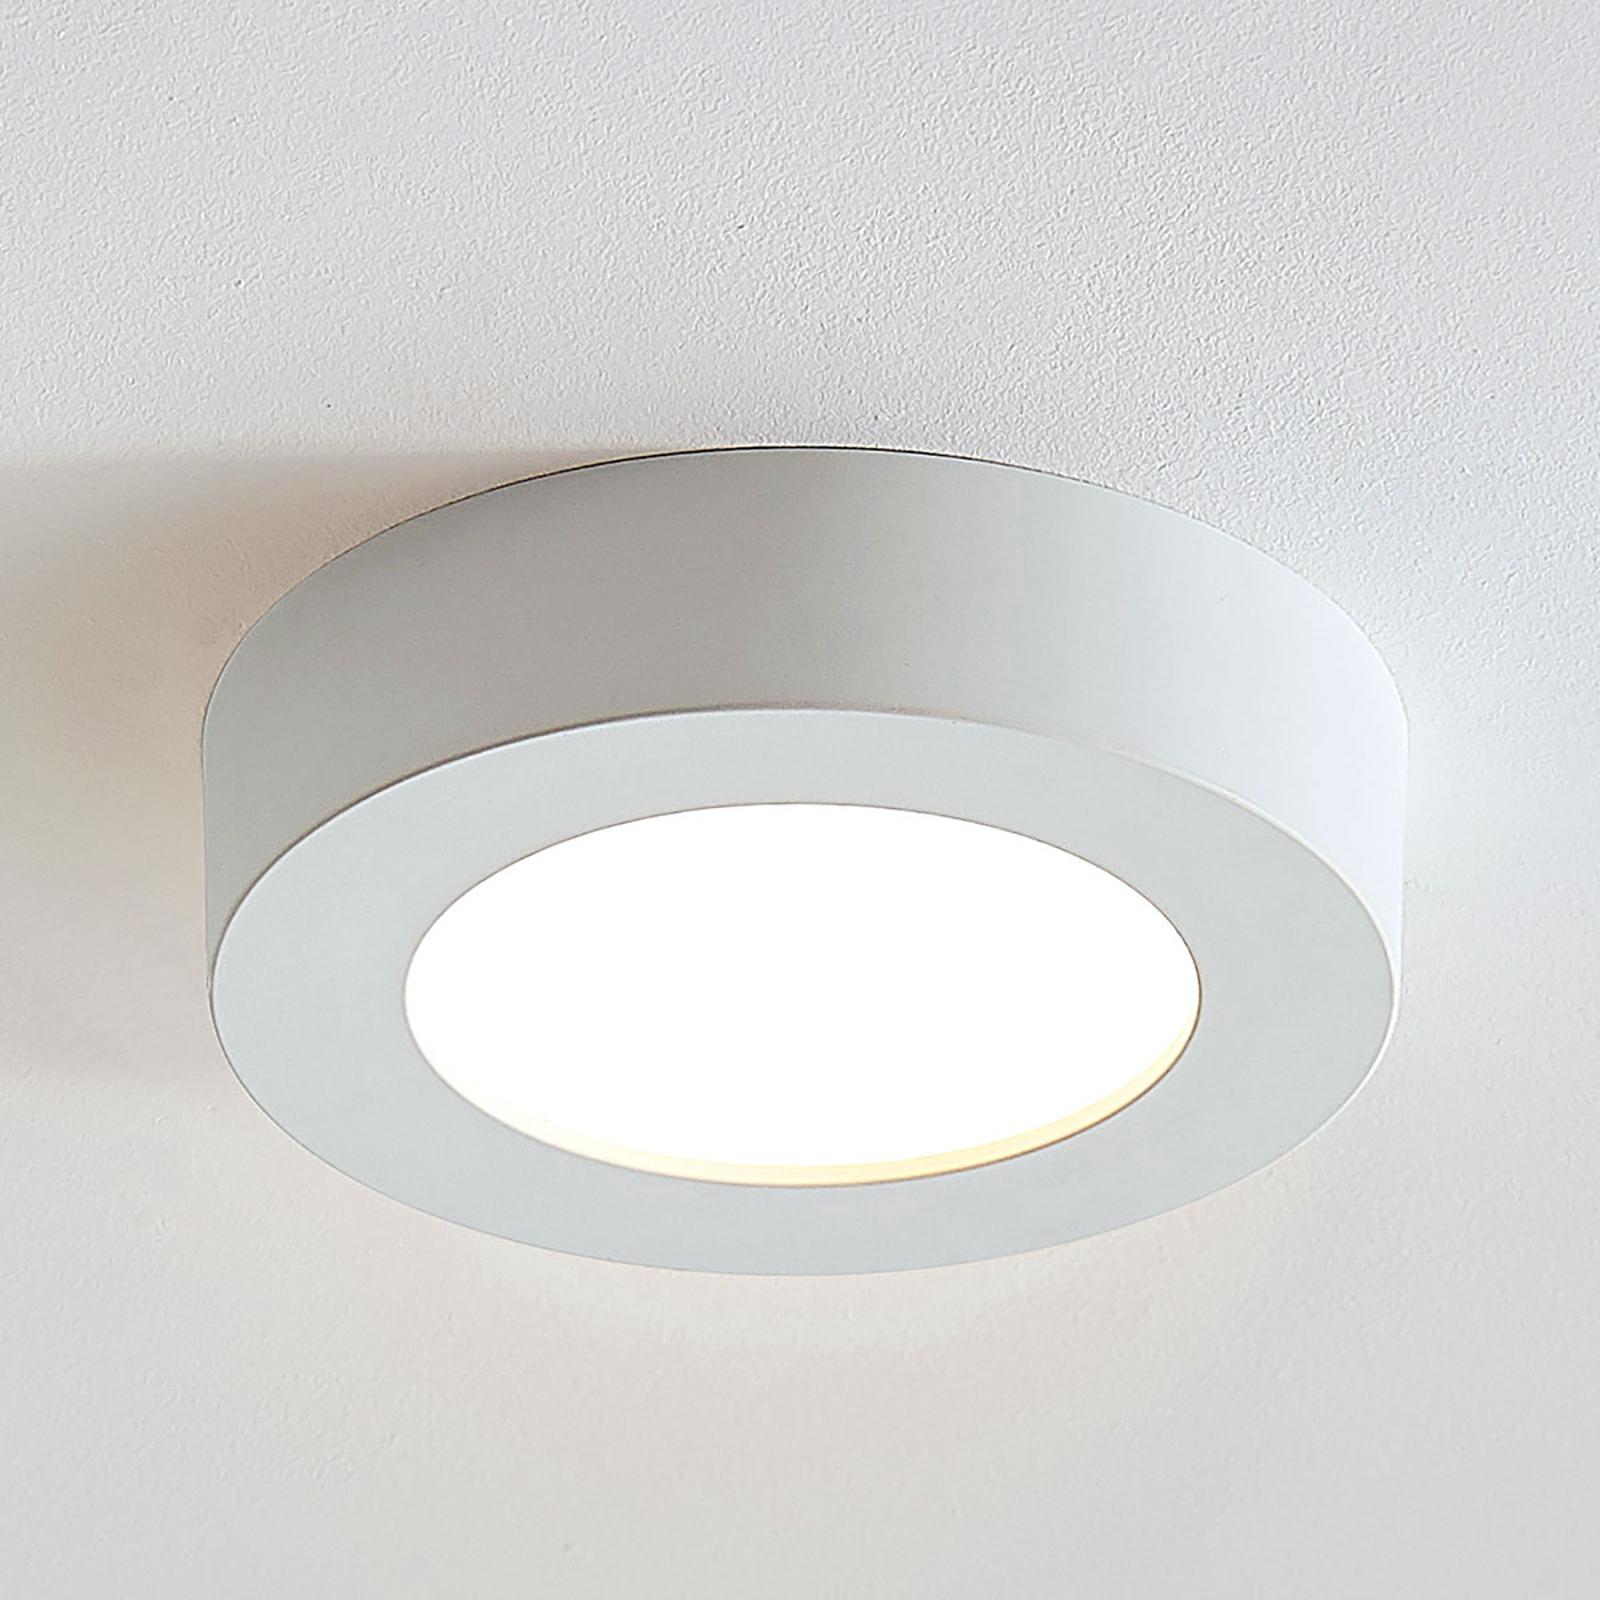 LED plafondlamp Marlo wit 3.000K rond 18,2 cm